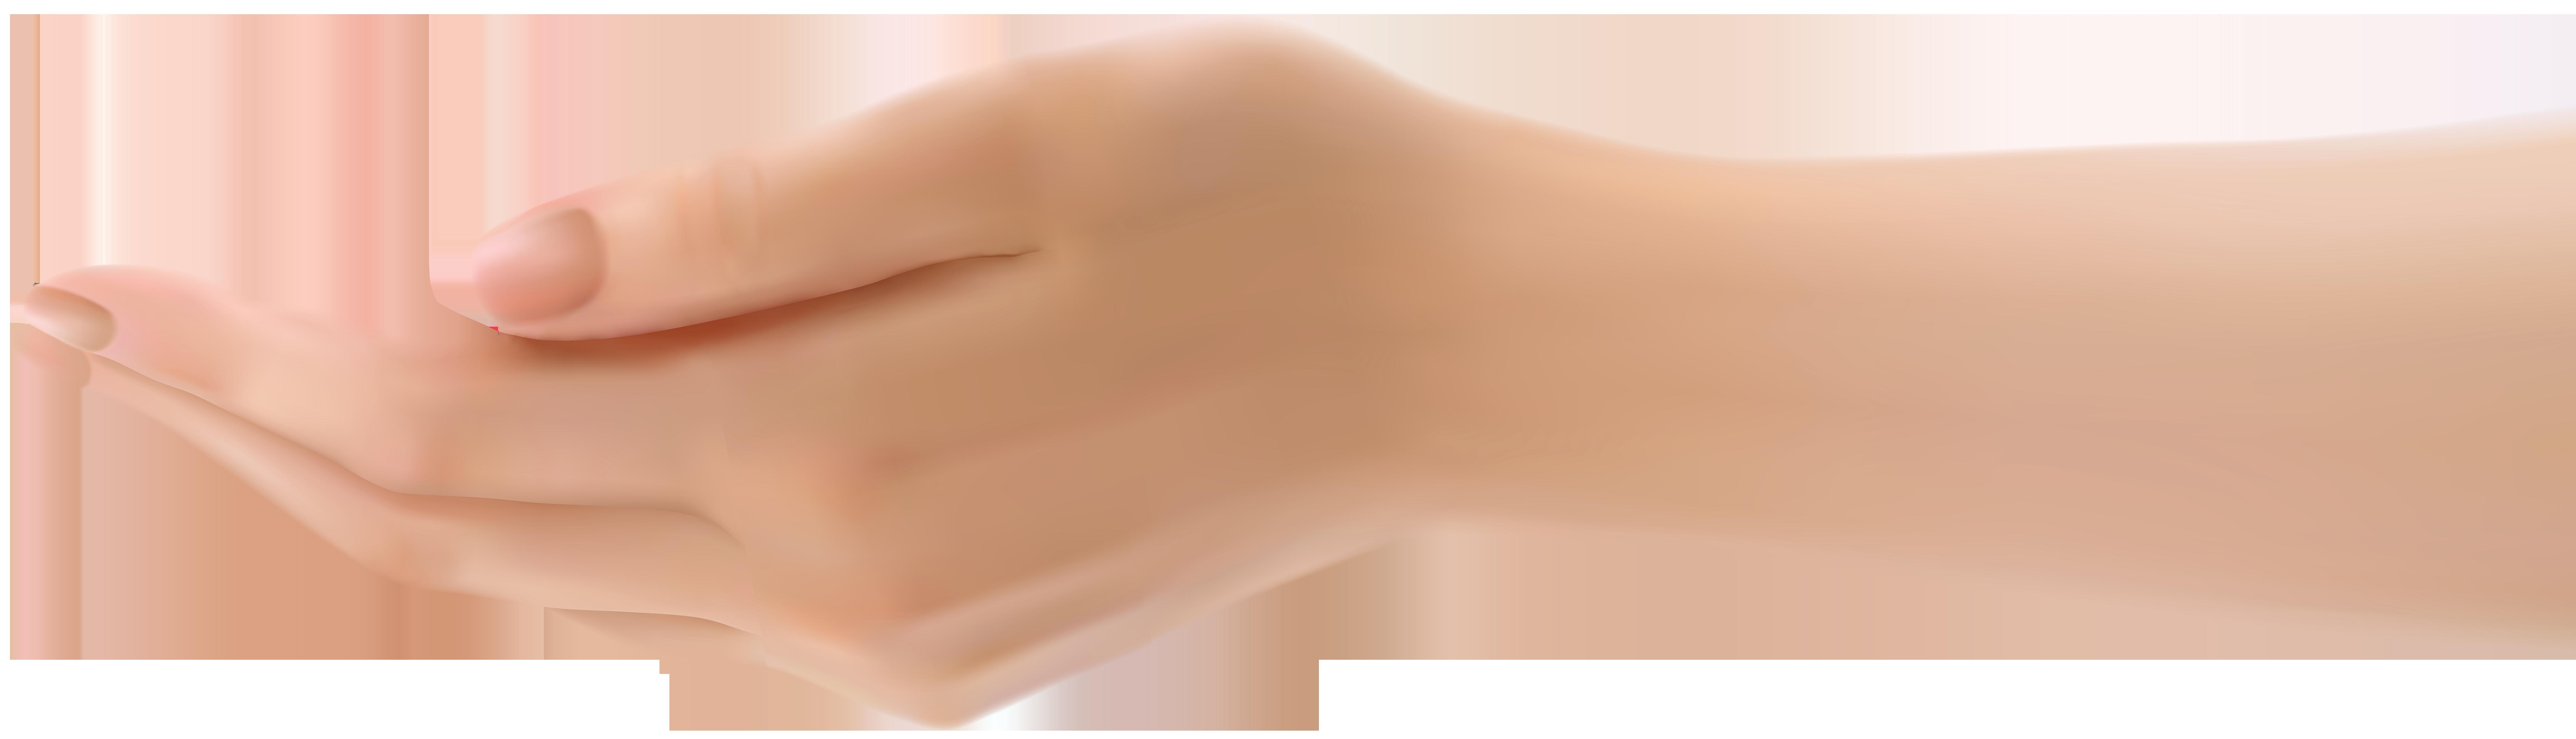 Neck clipart transparent. Hand png clip art